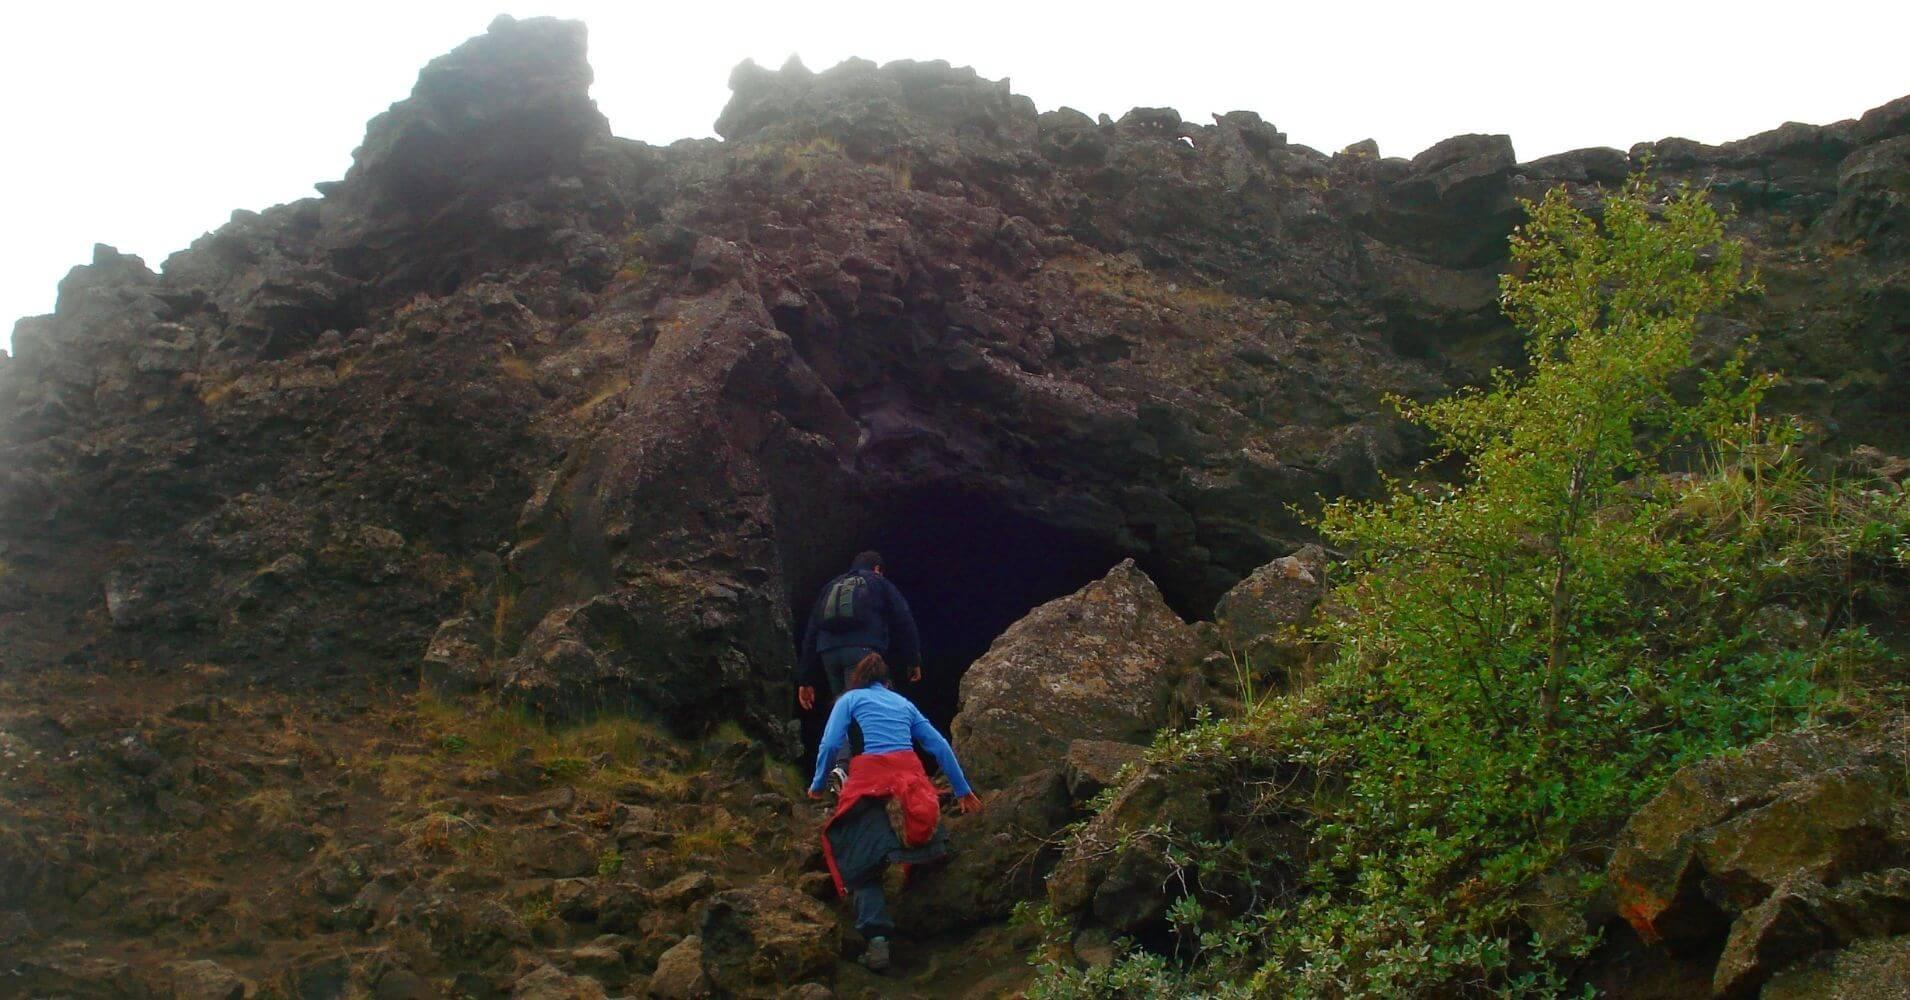 Dimmuborgir, Castillos Negros. Lago Mývatn. Norte de Islandia.